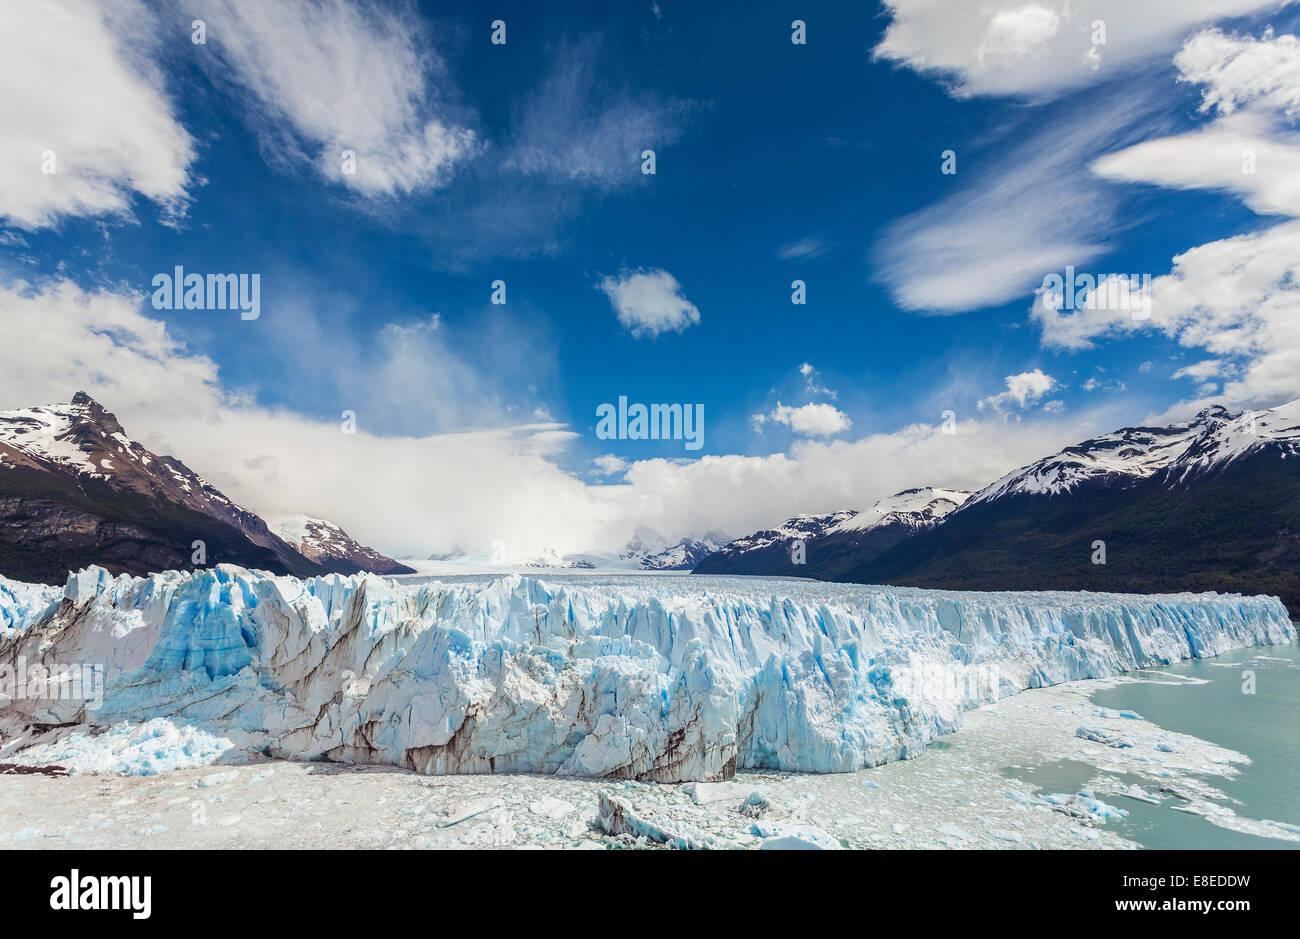 Perito Moreno Glacier in the Los Glaciares National Park, Argentina. Stock Photo